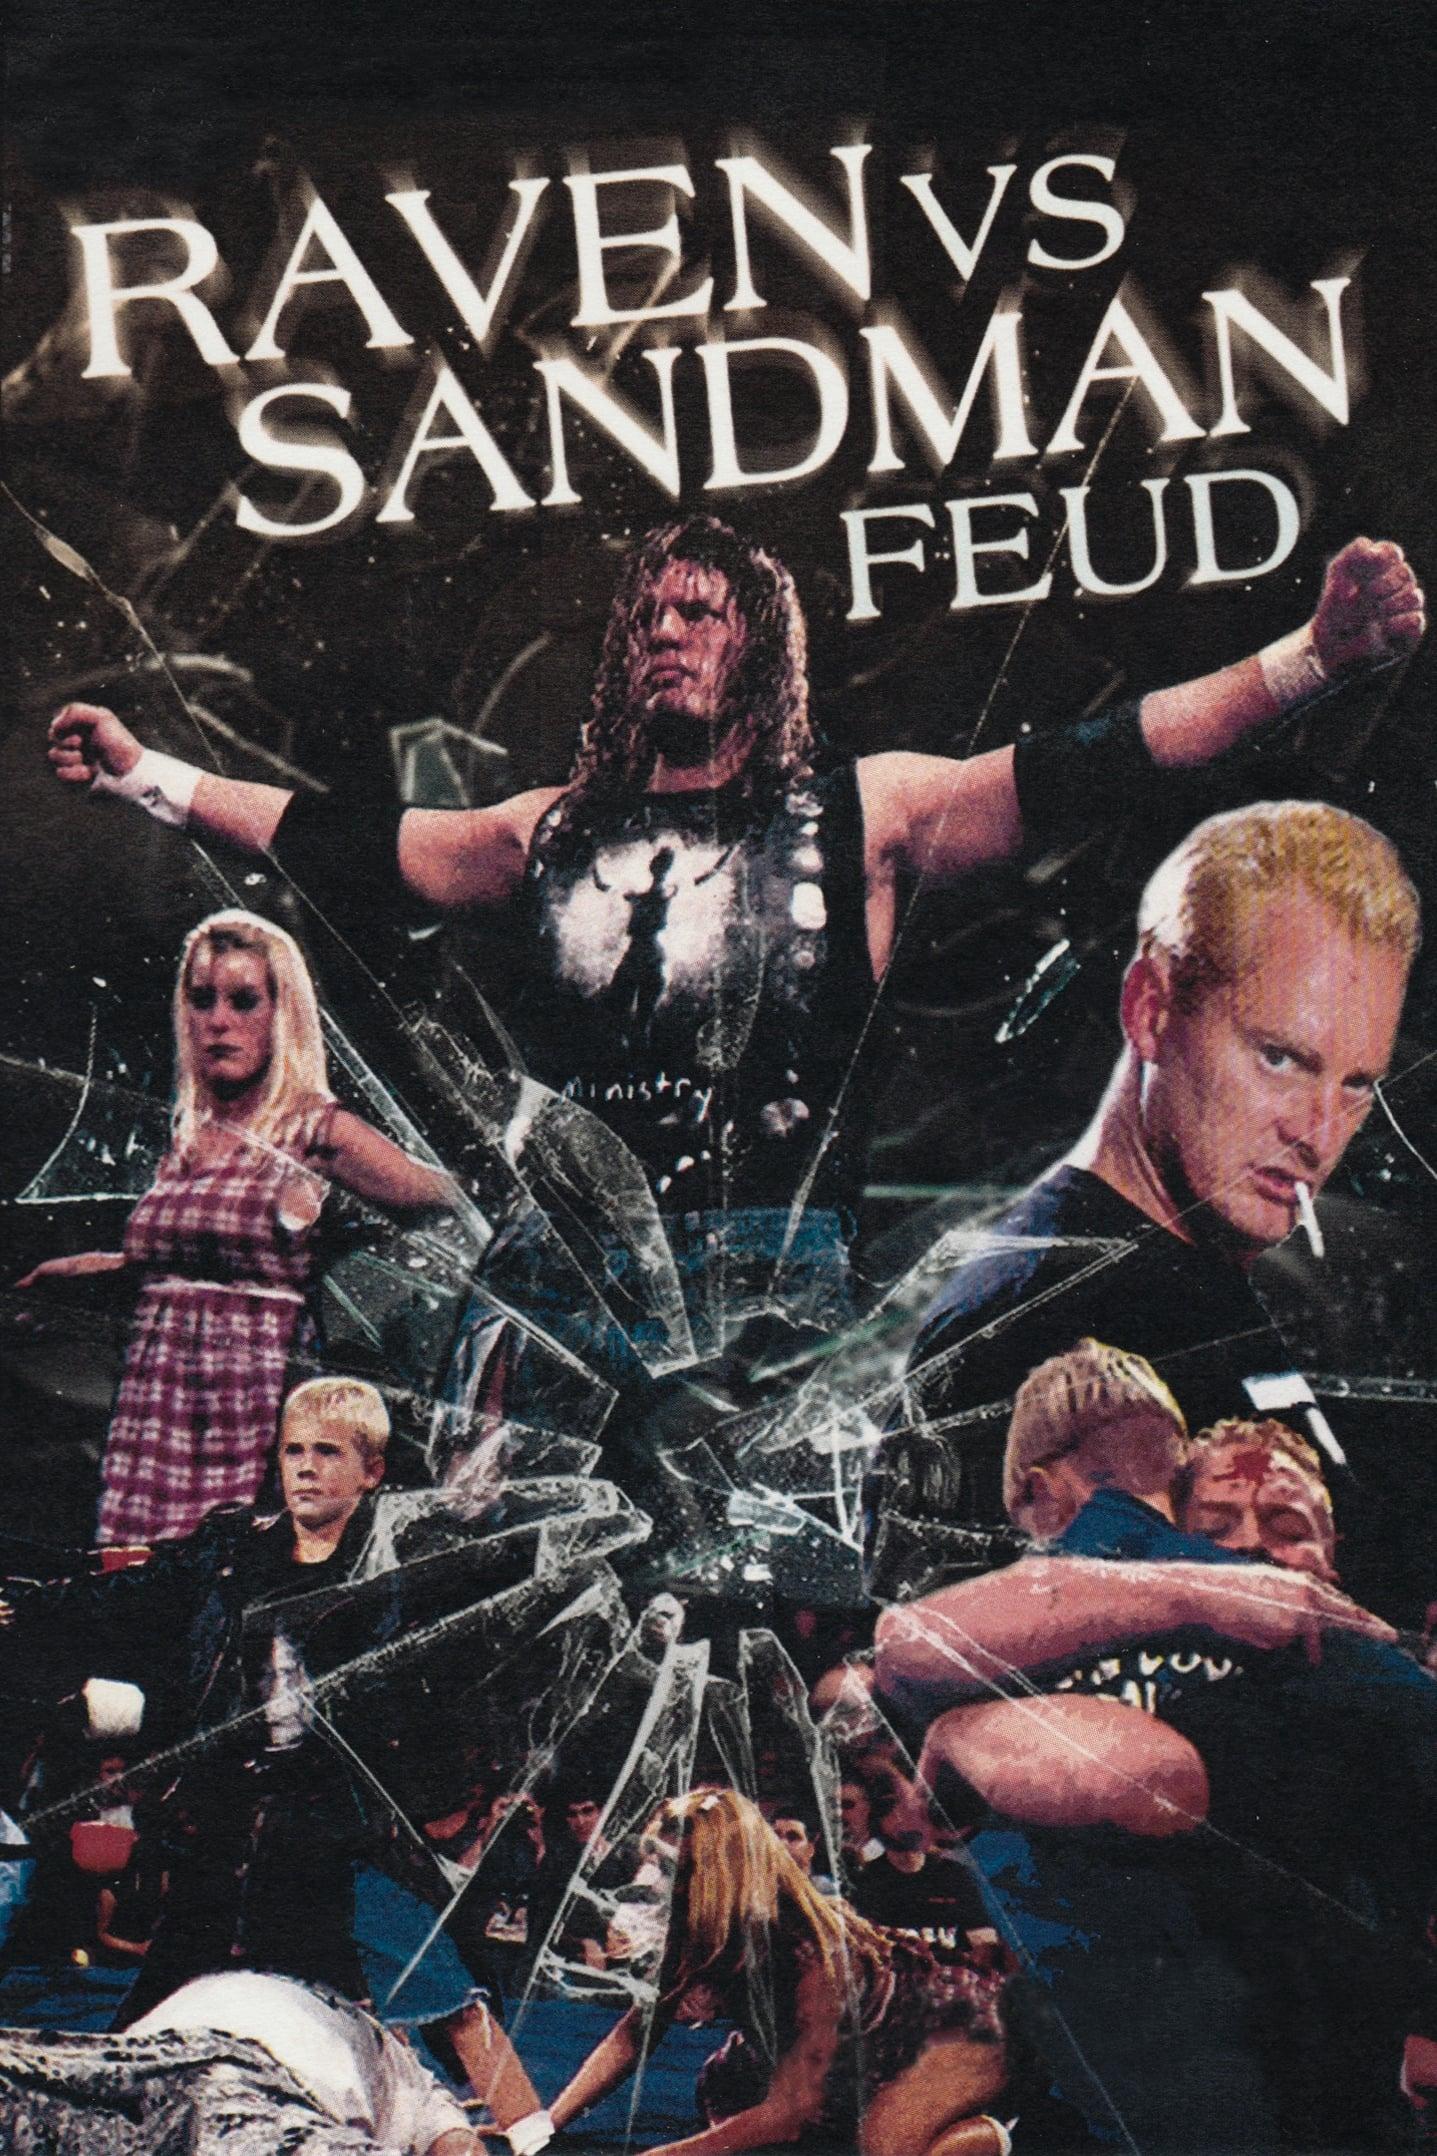 Raven vs Sandman Feud